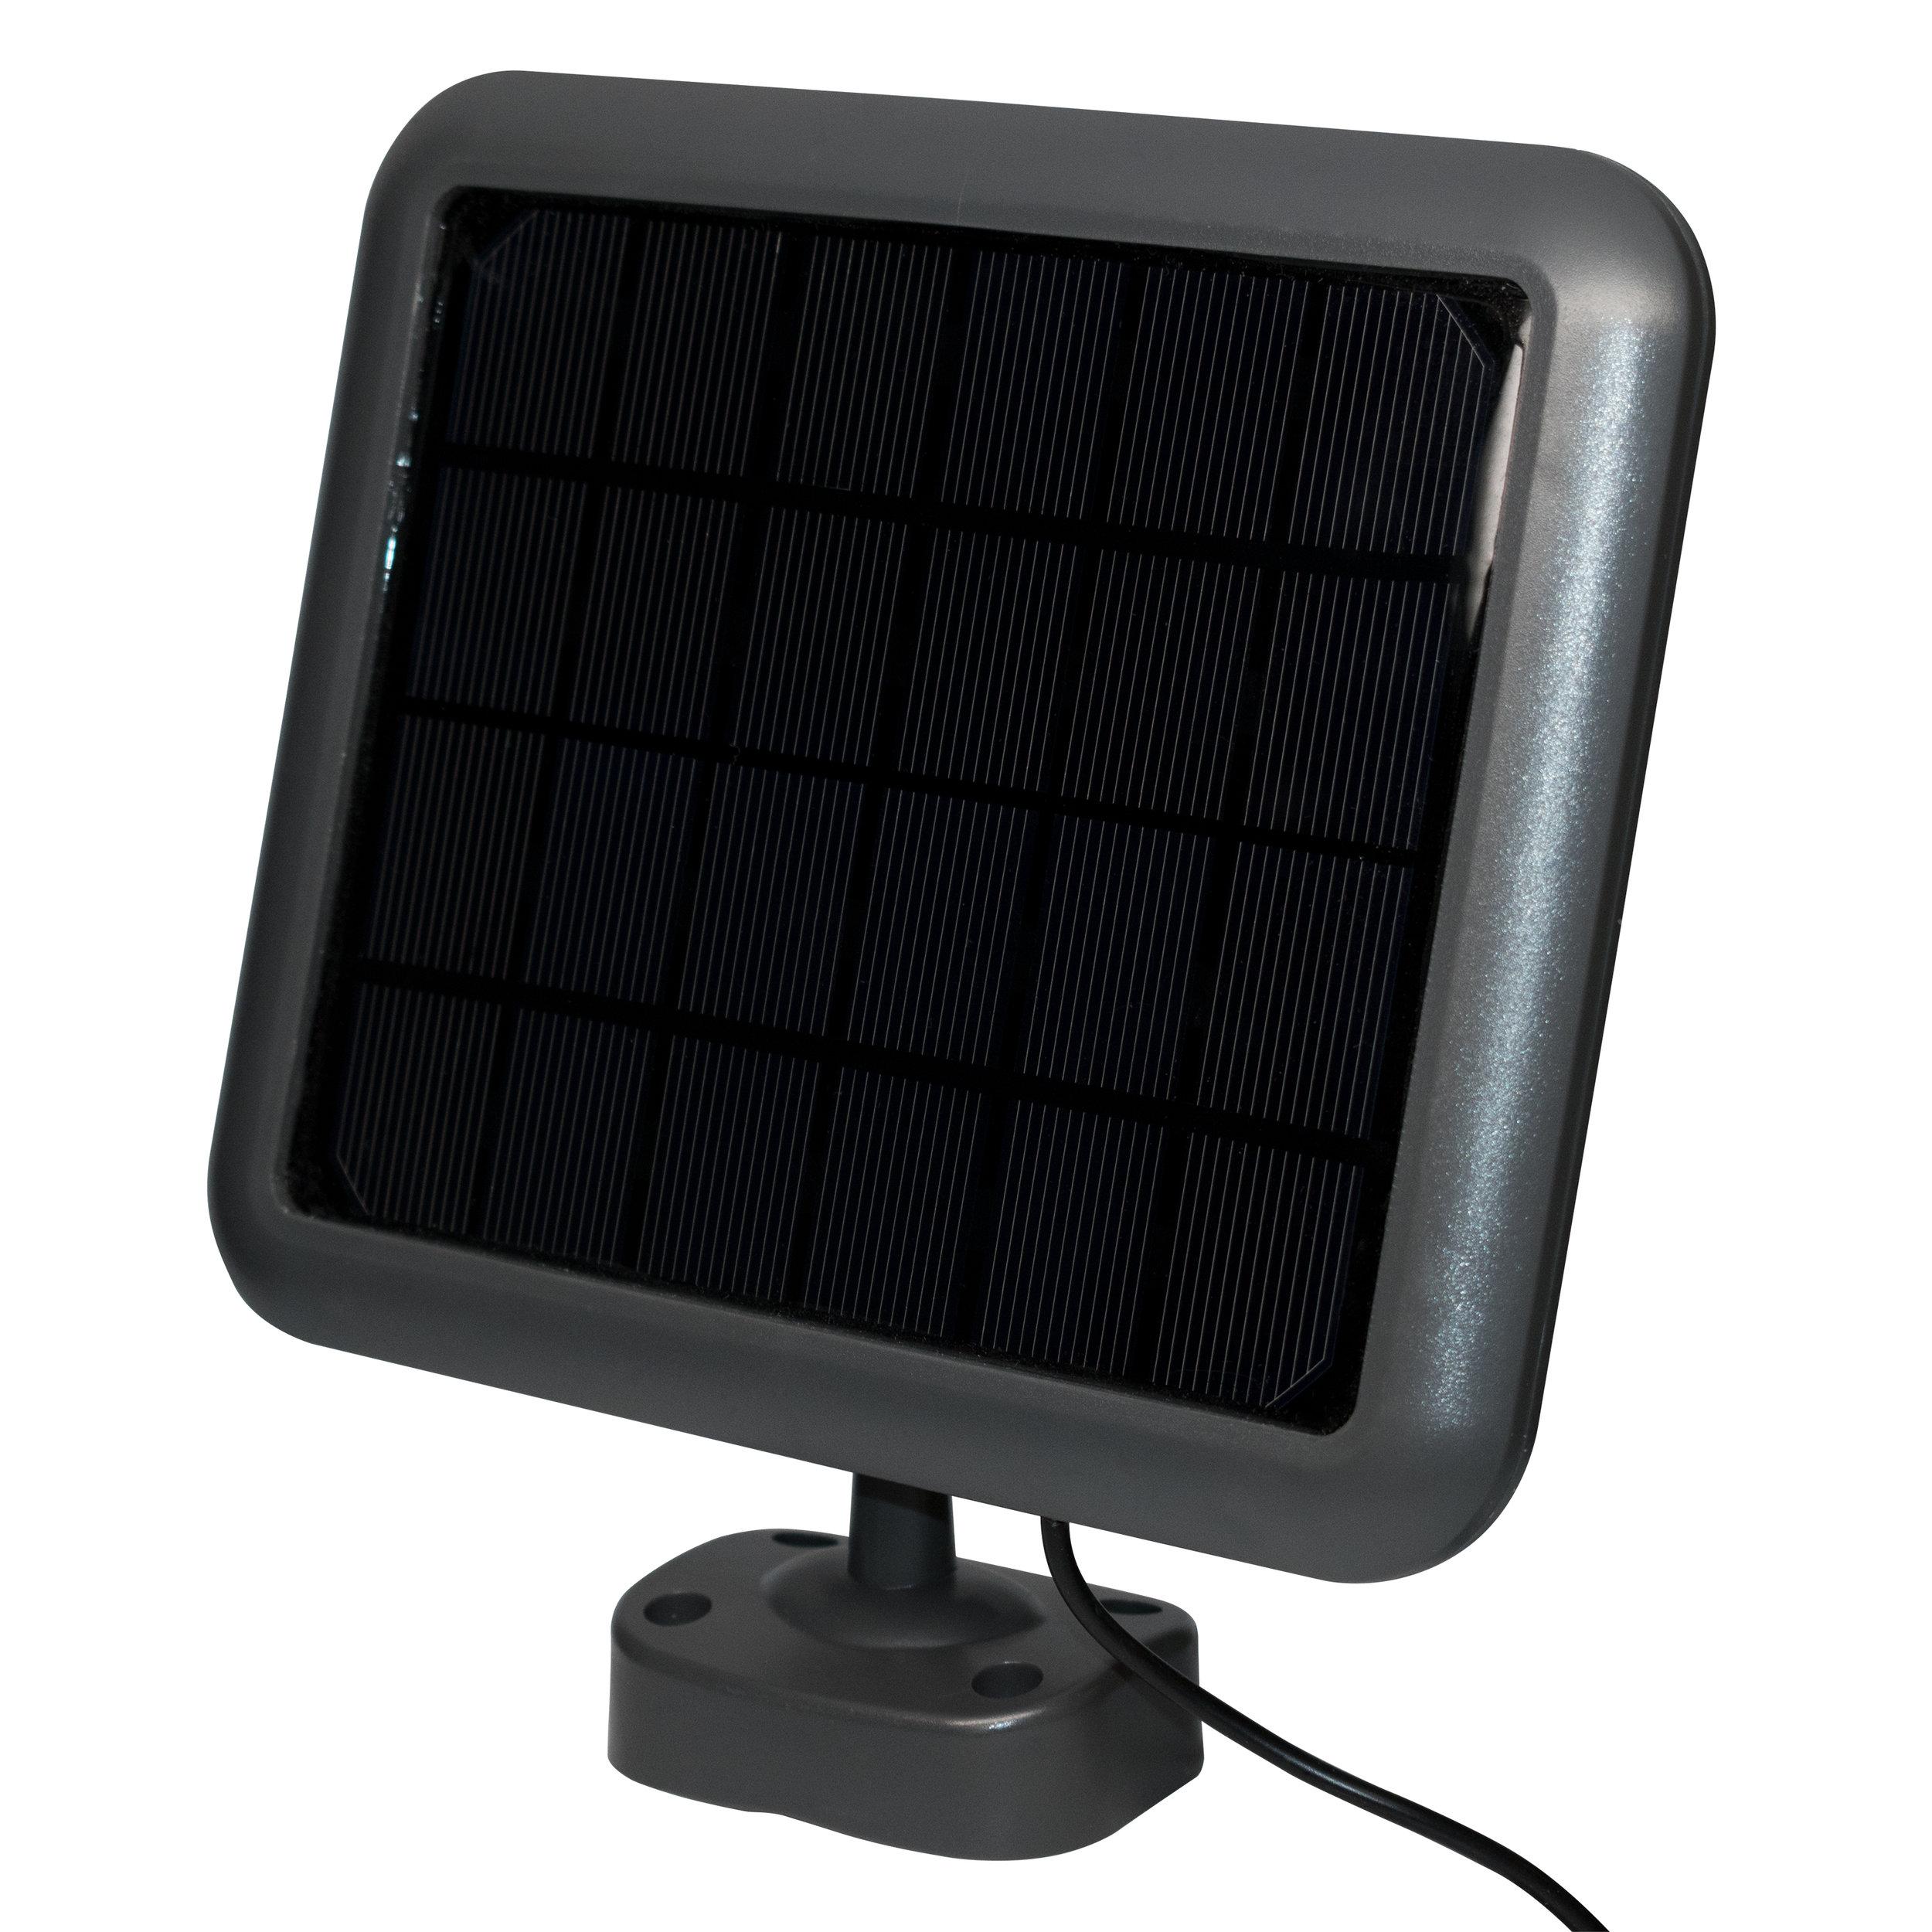 NL-DSG2 Solar Security Light, Solar Panel